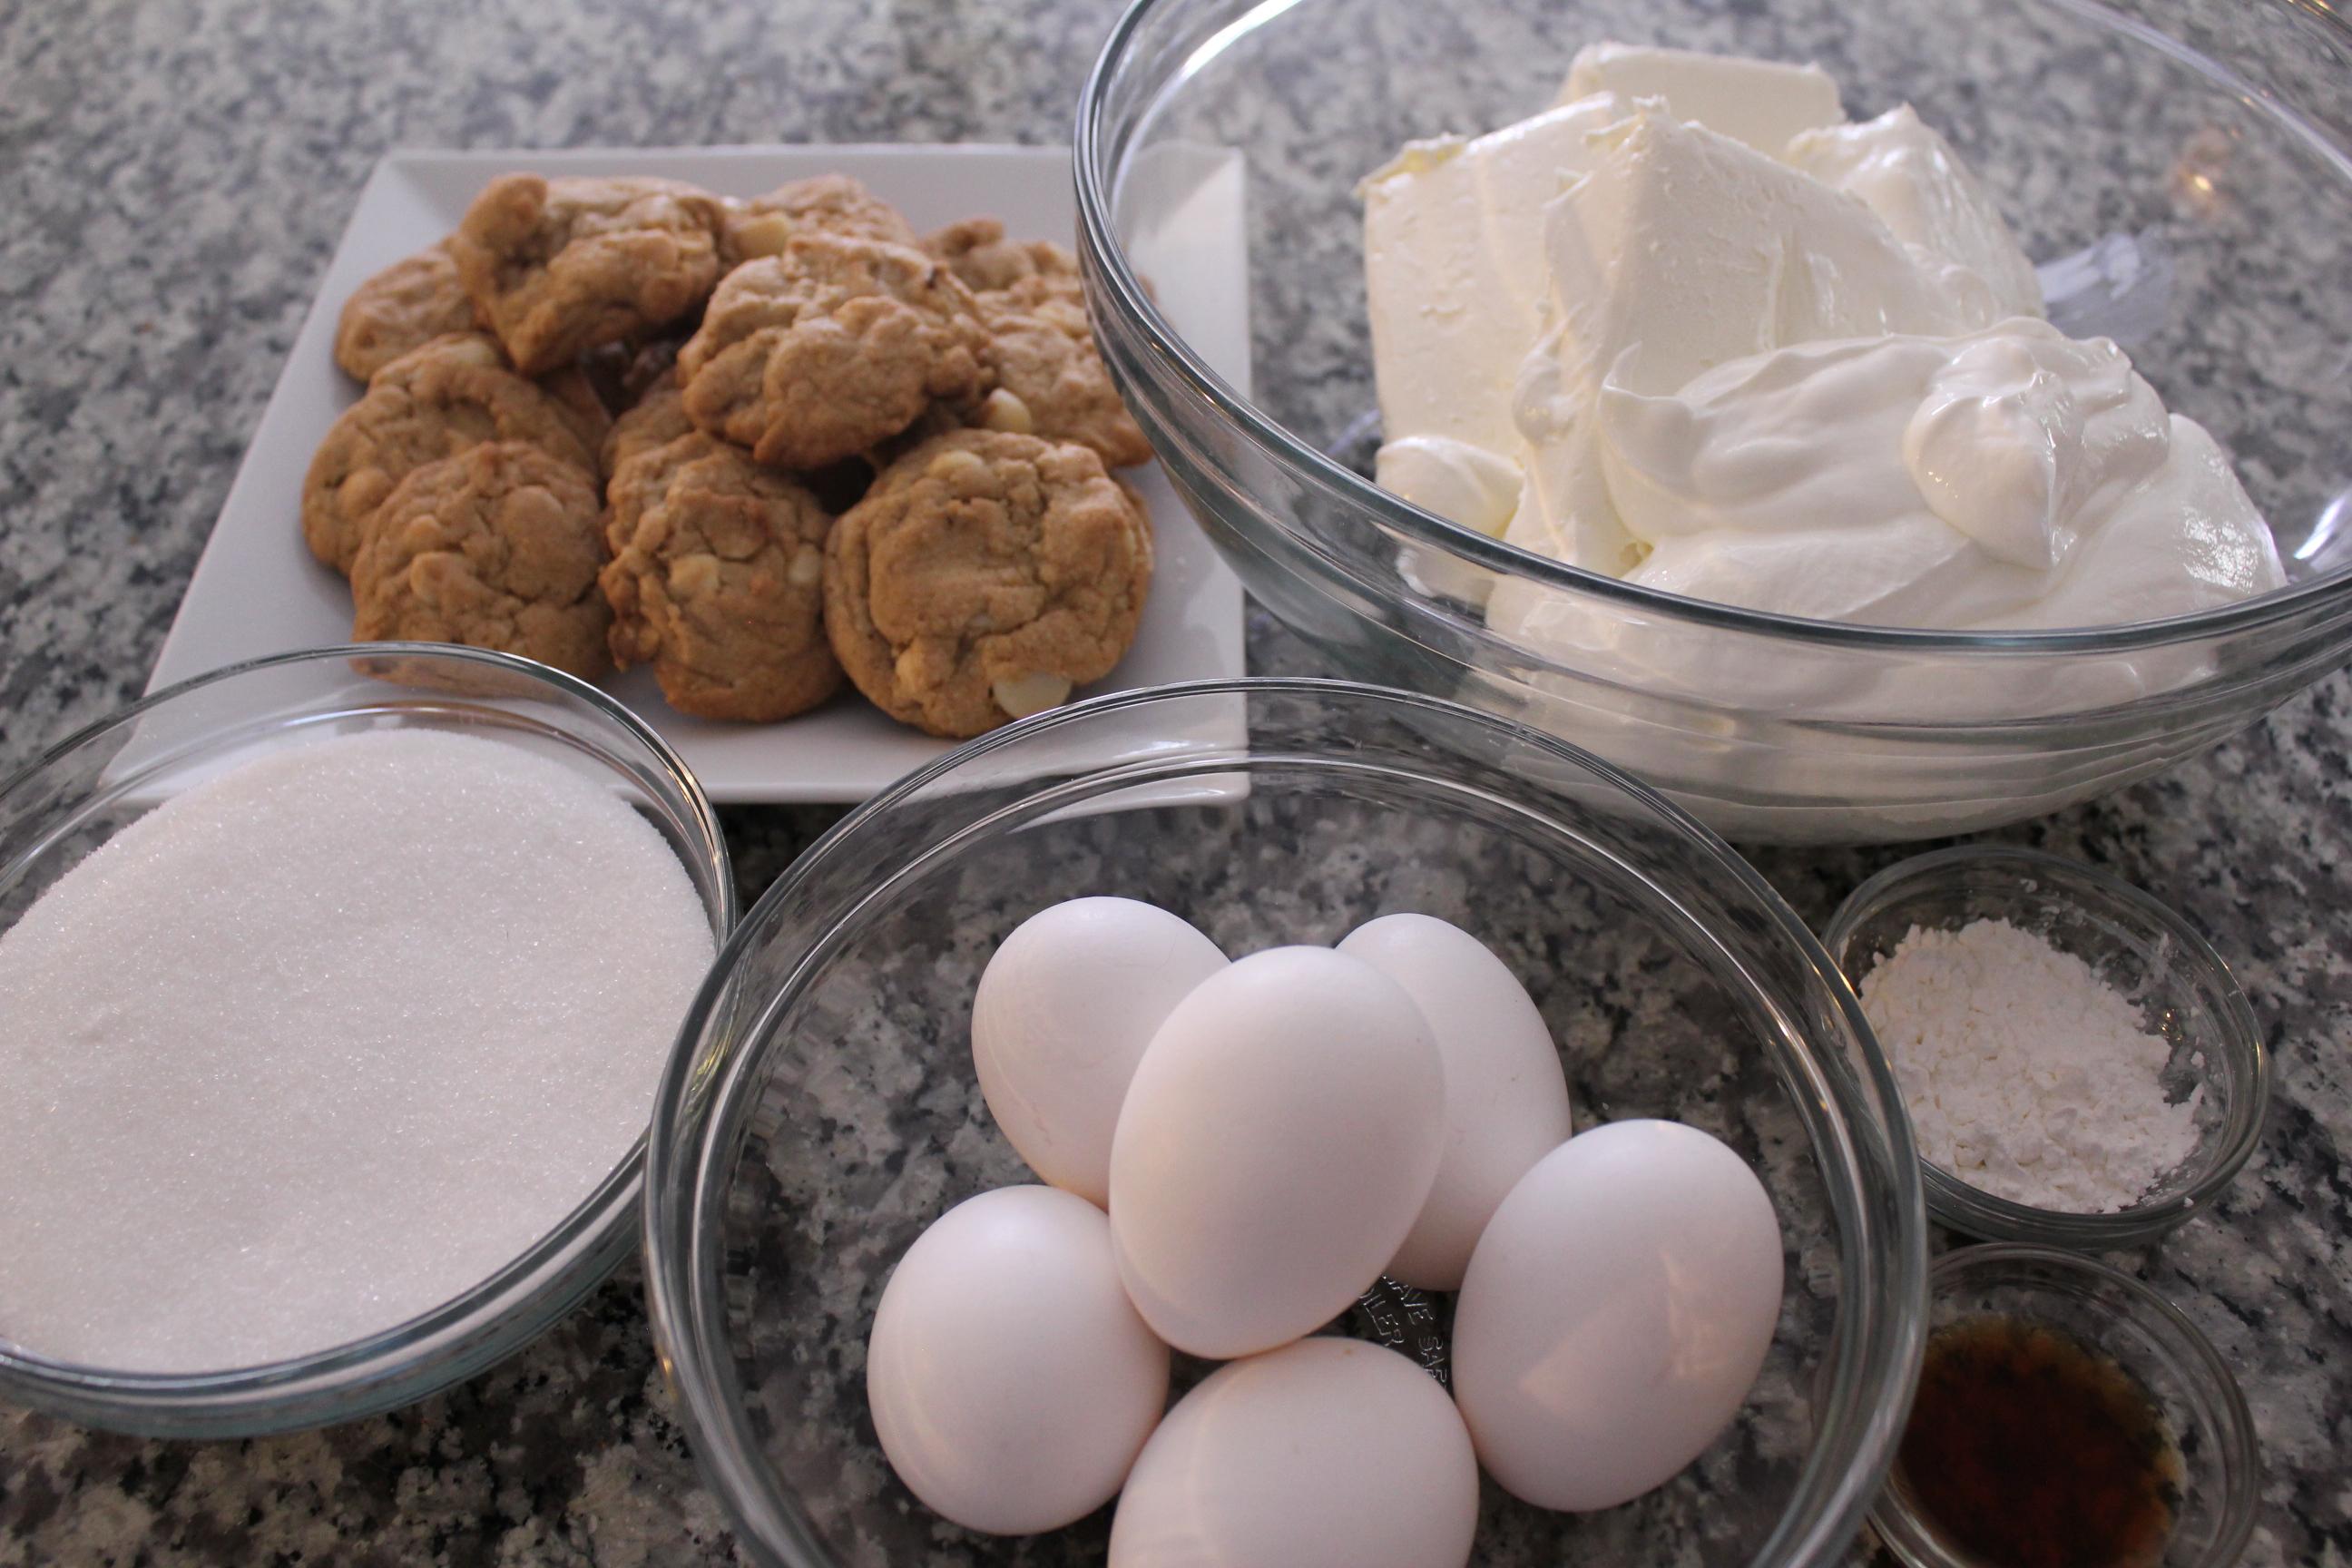 White Chocolate Macadamia Nut Cheesecake Ingredients